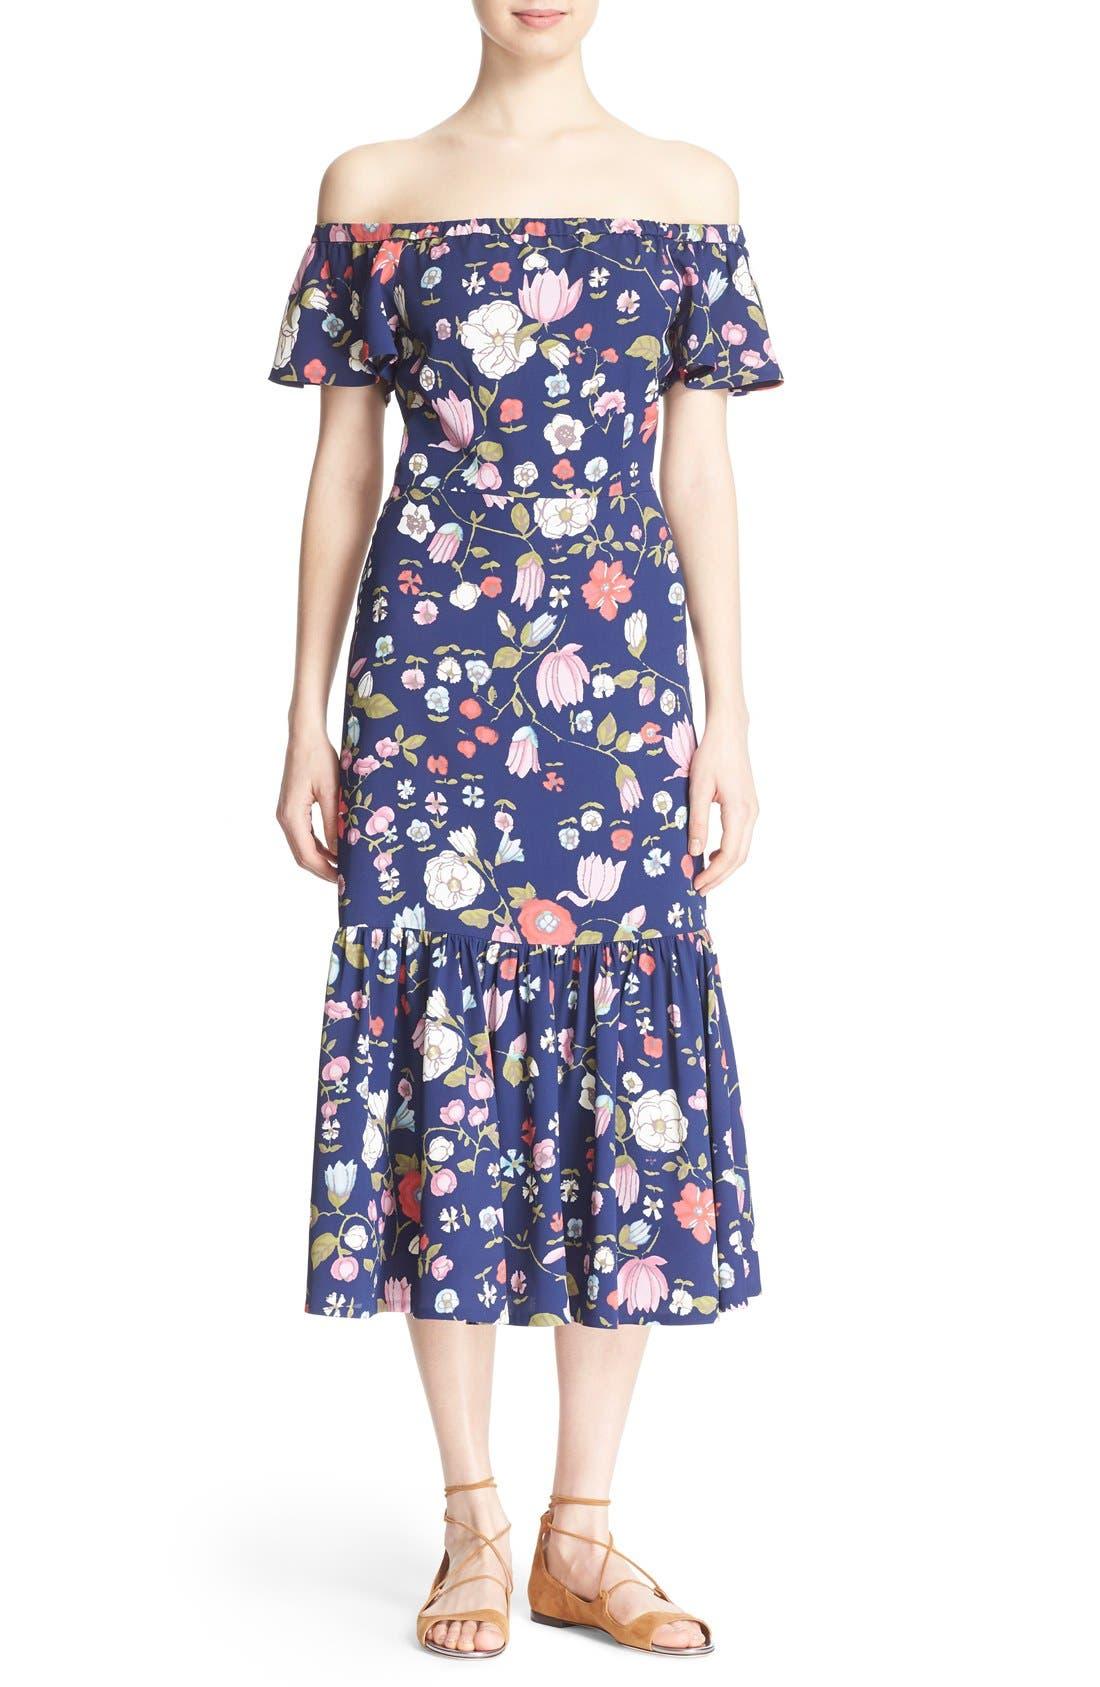 REBECCA TAYLOR, Off the Shoulder Floral Print Dress, Main thumbnail 1, color, 510